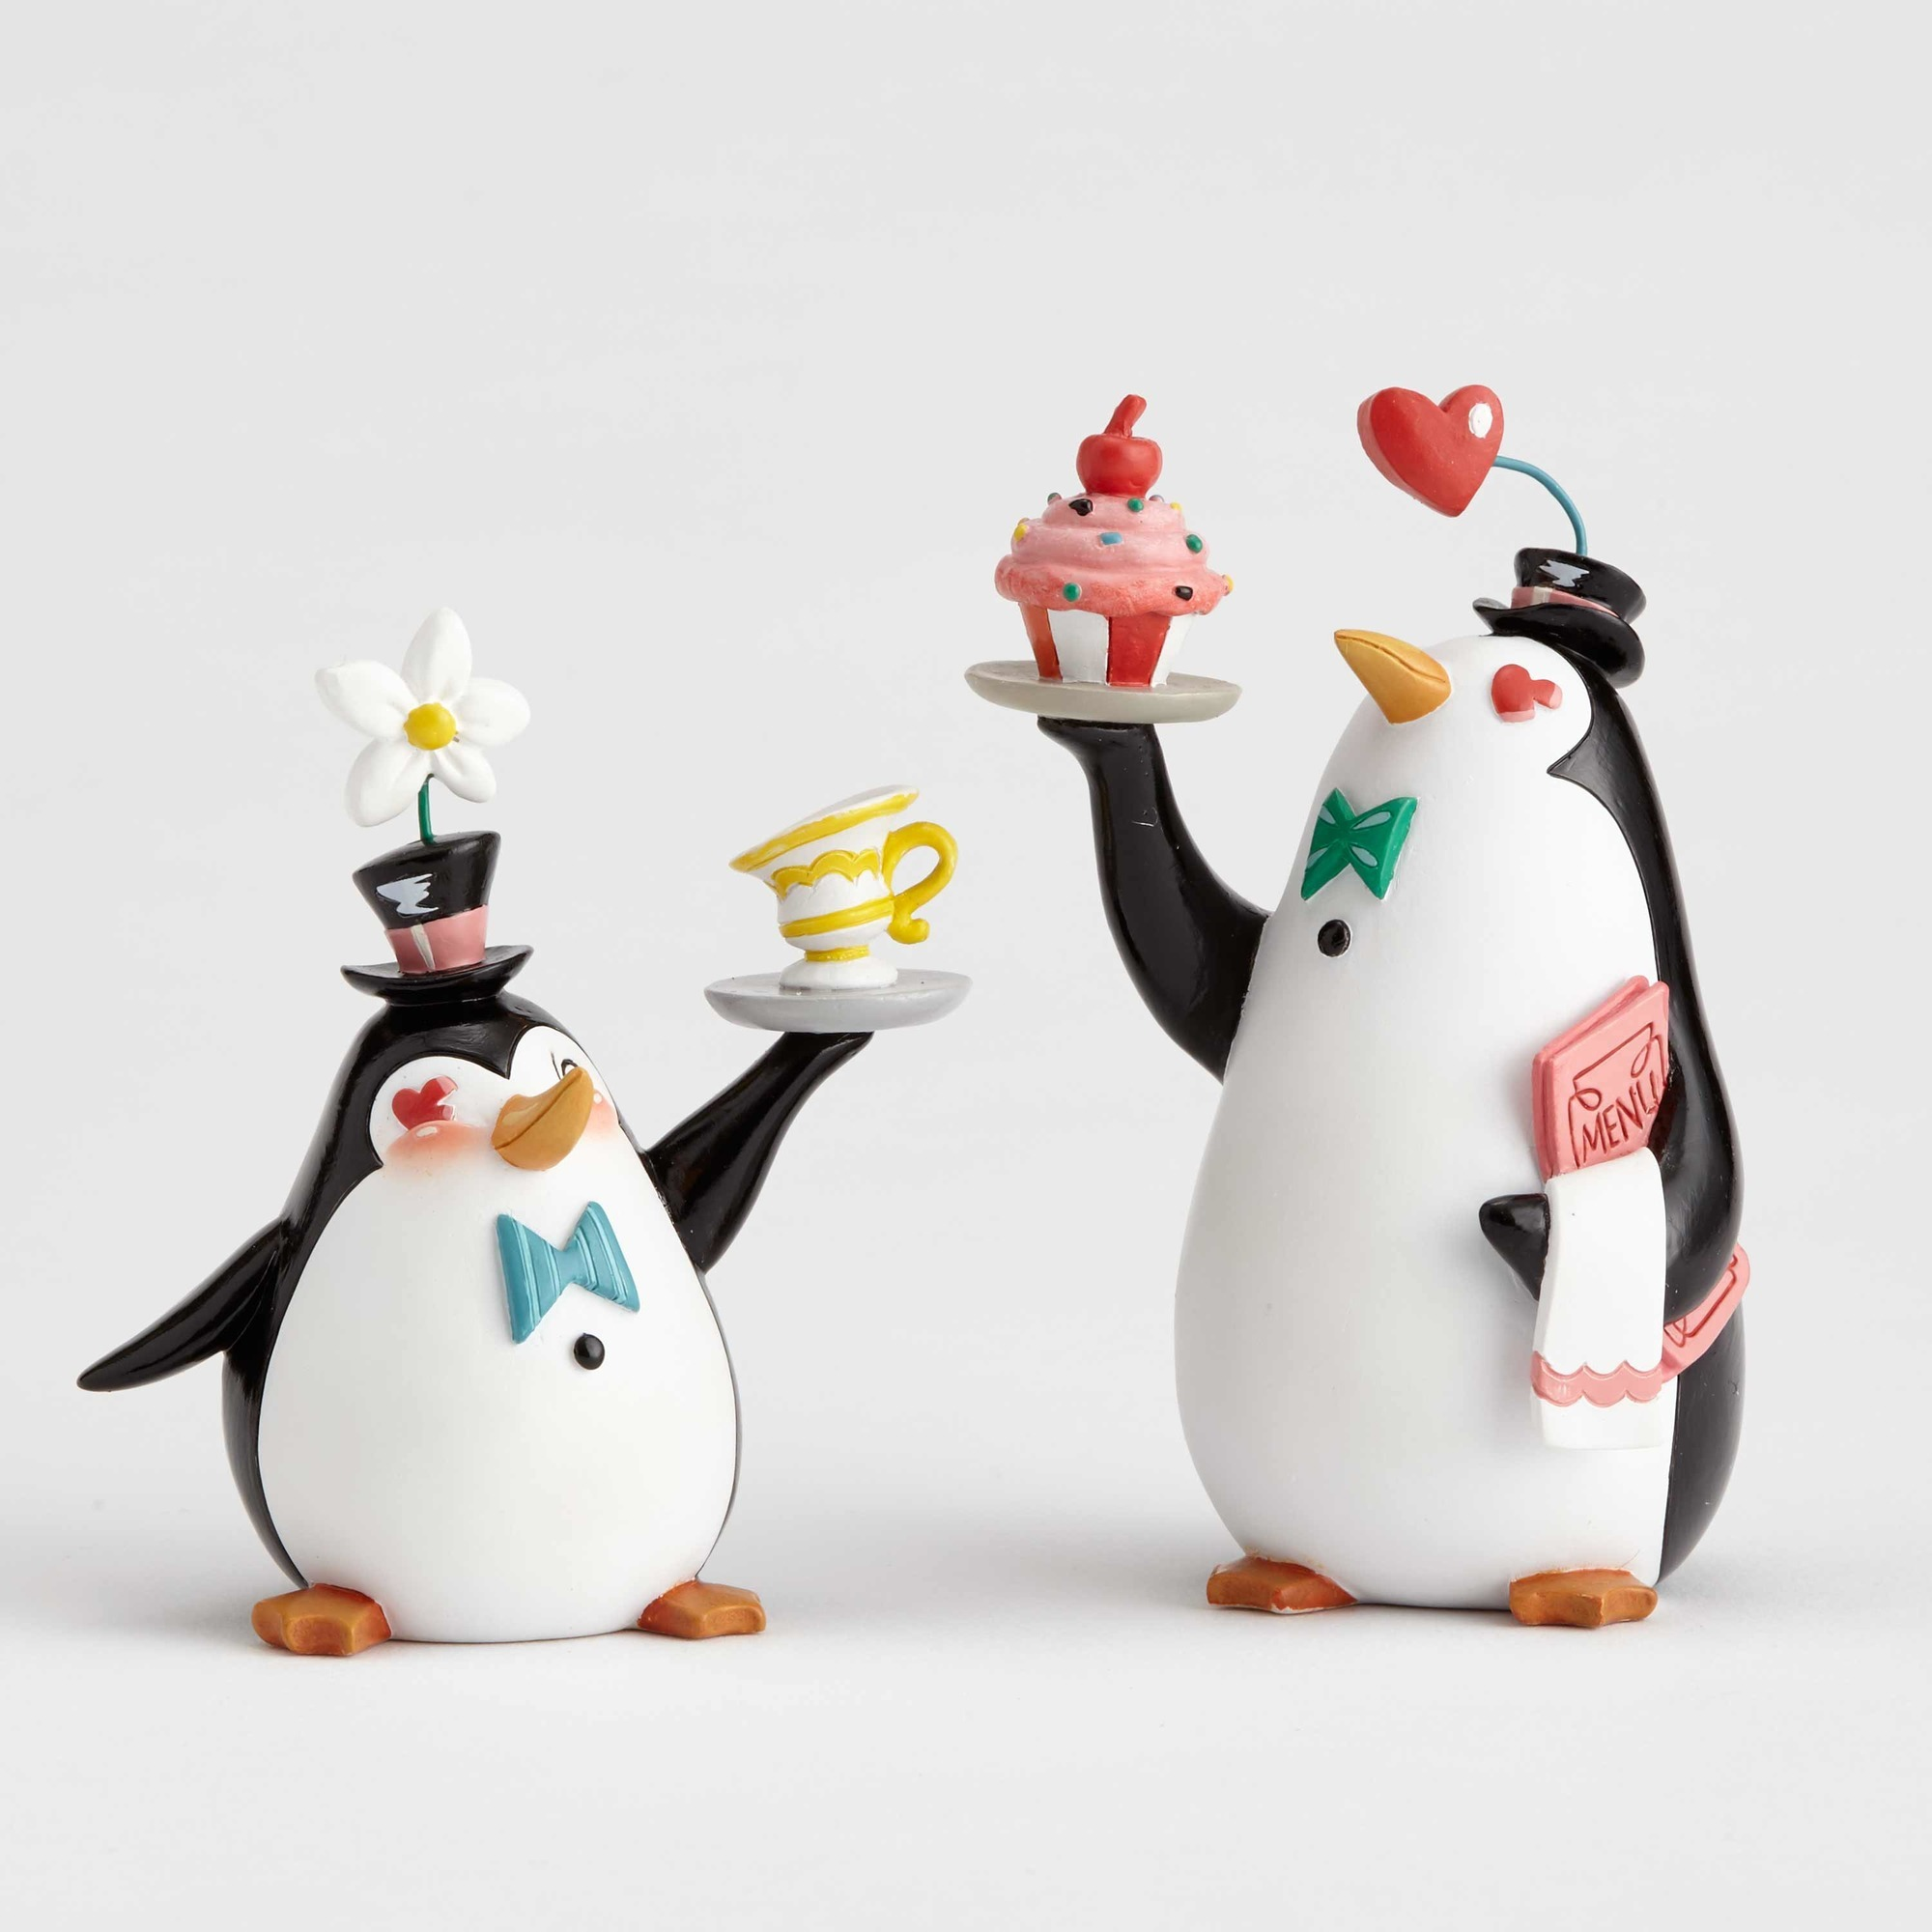 World of Miss Mindy 6001672 Penguin Waiters